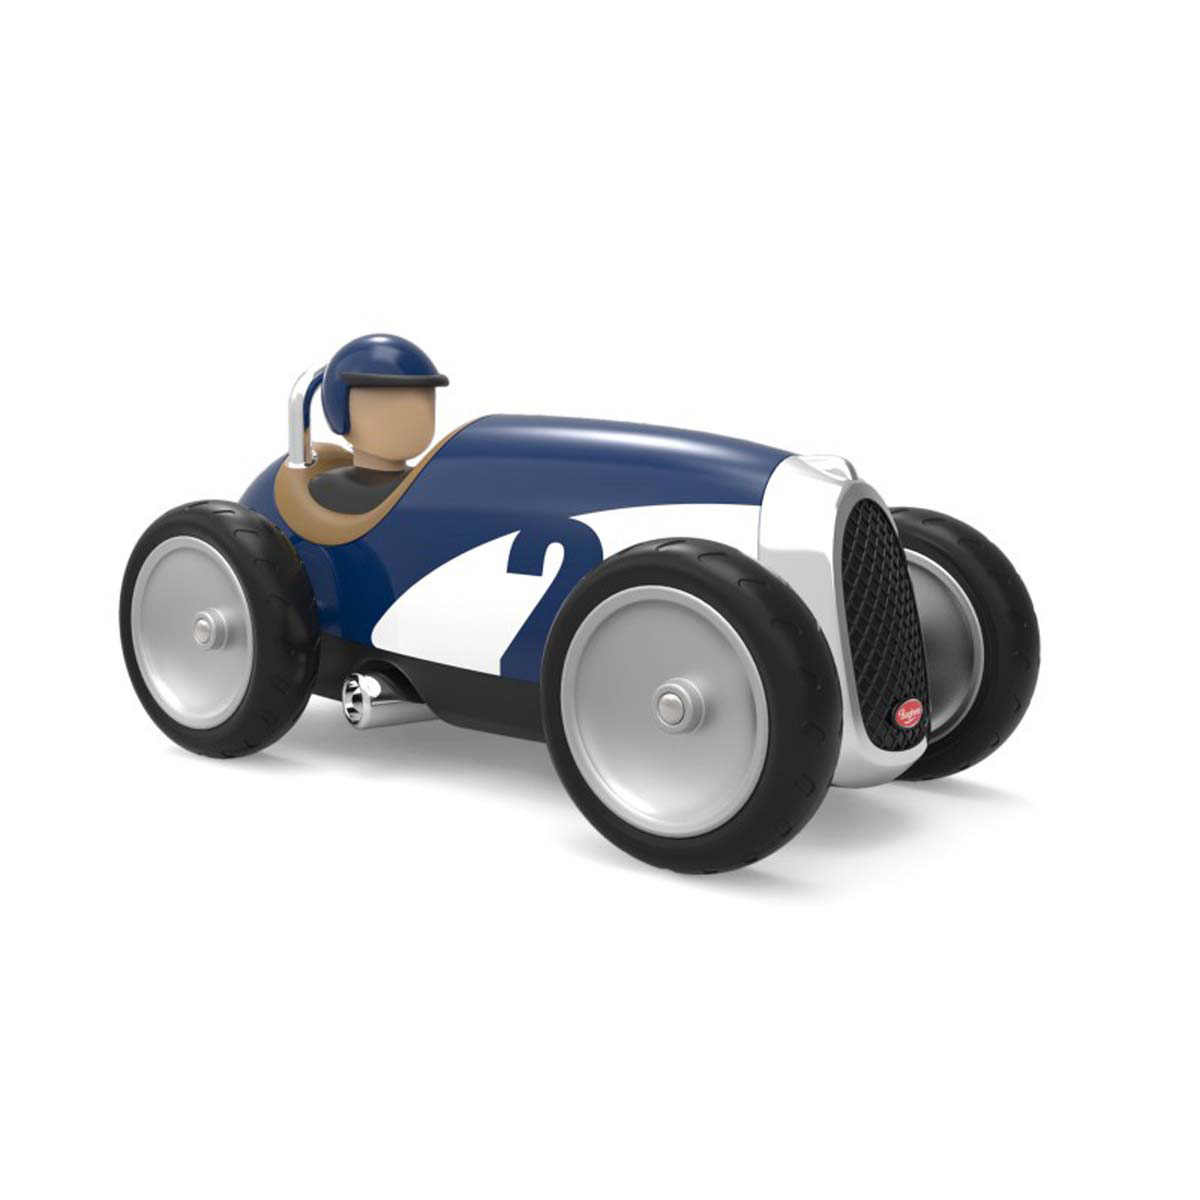 Mes premiers jouets Voiture en Métal Racing Car - Bleu Voiture en Métal Racing Car - Bleu